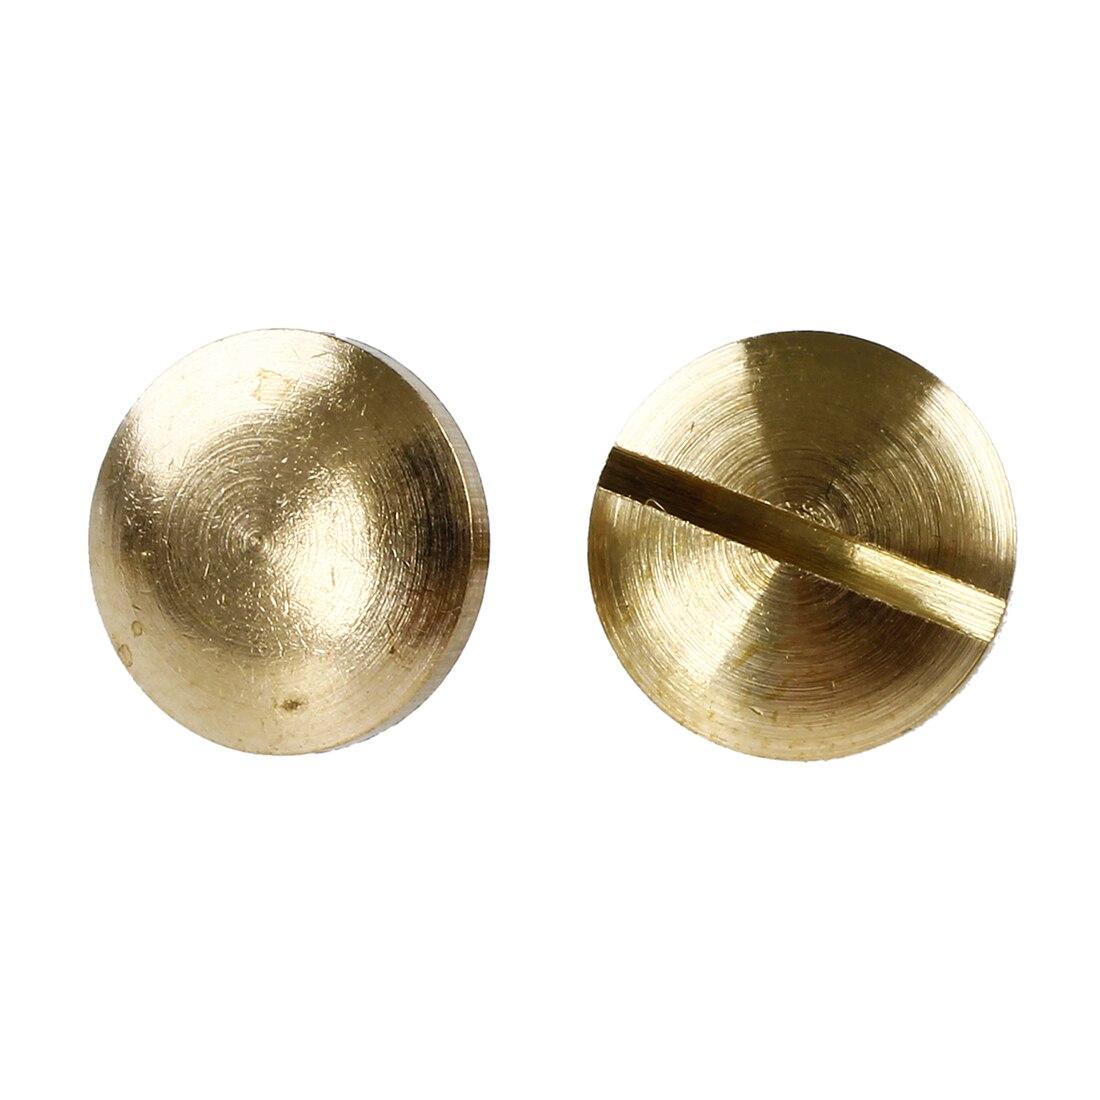 SZ Hot 10x Arc Solid Brass Button Stud Screw Nail Screw back Leather Rivet Belt 6mm